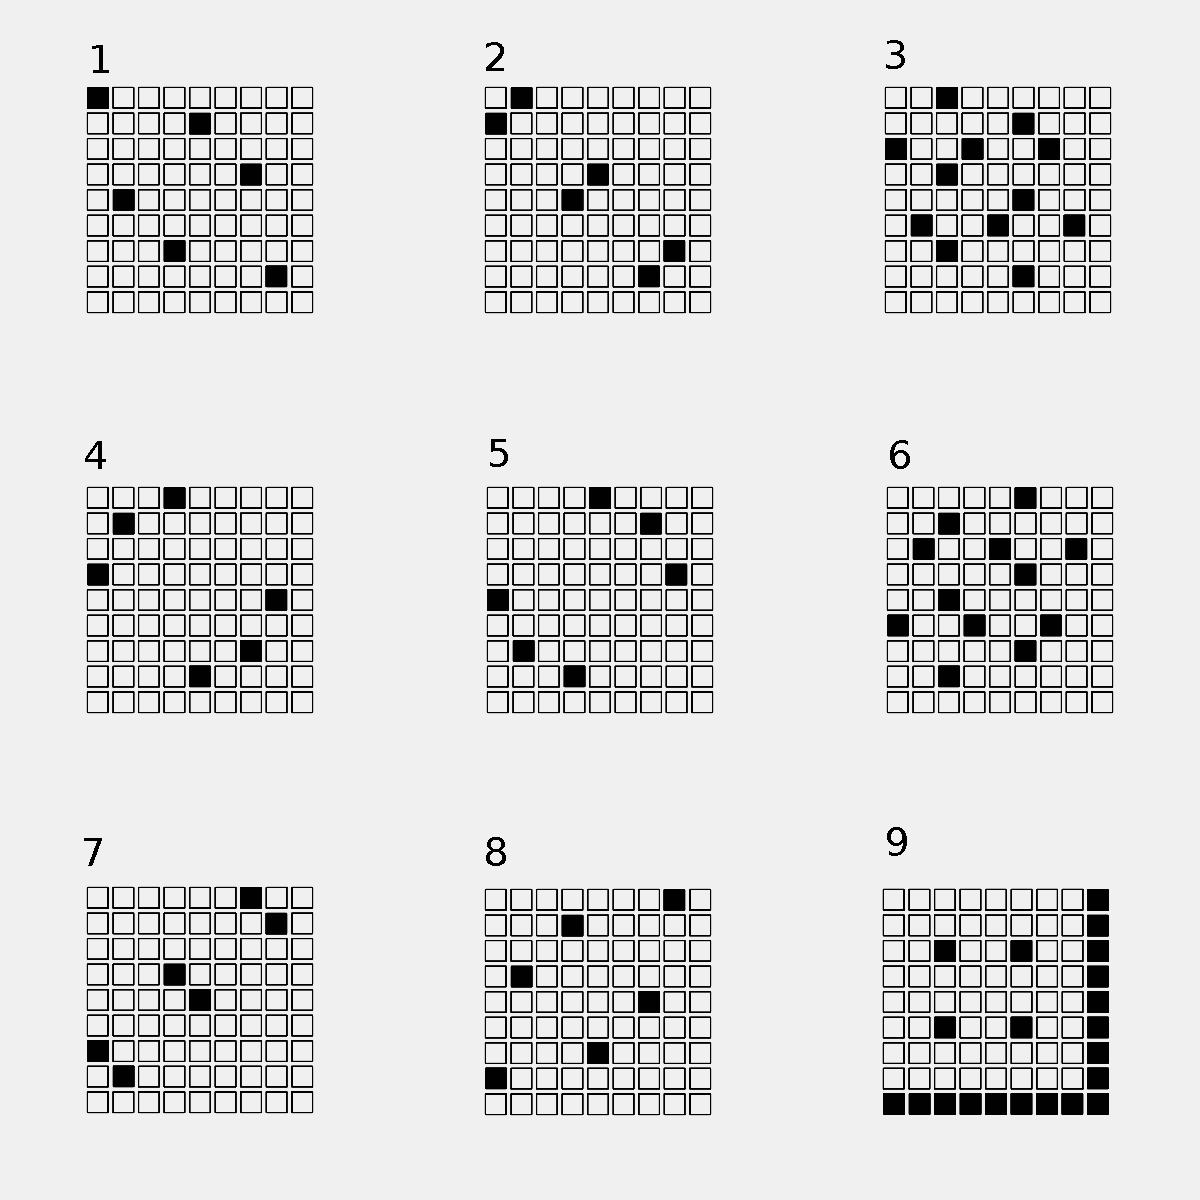 Grade 9 Modulo Art Kaleidoscopic Grid Design